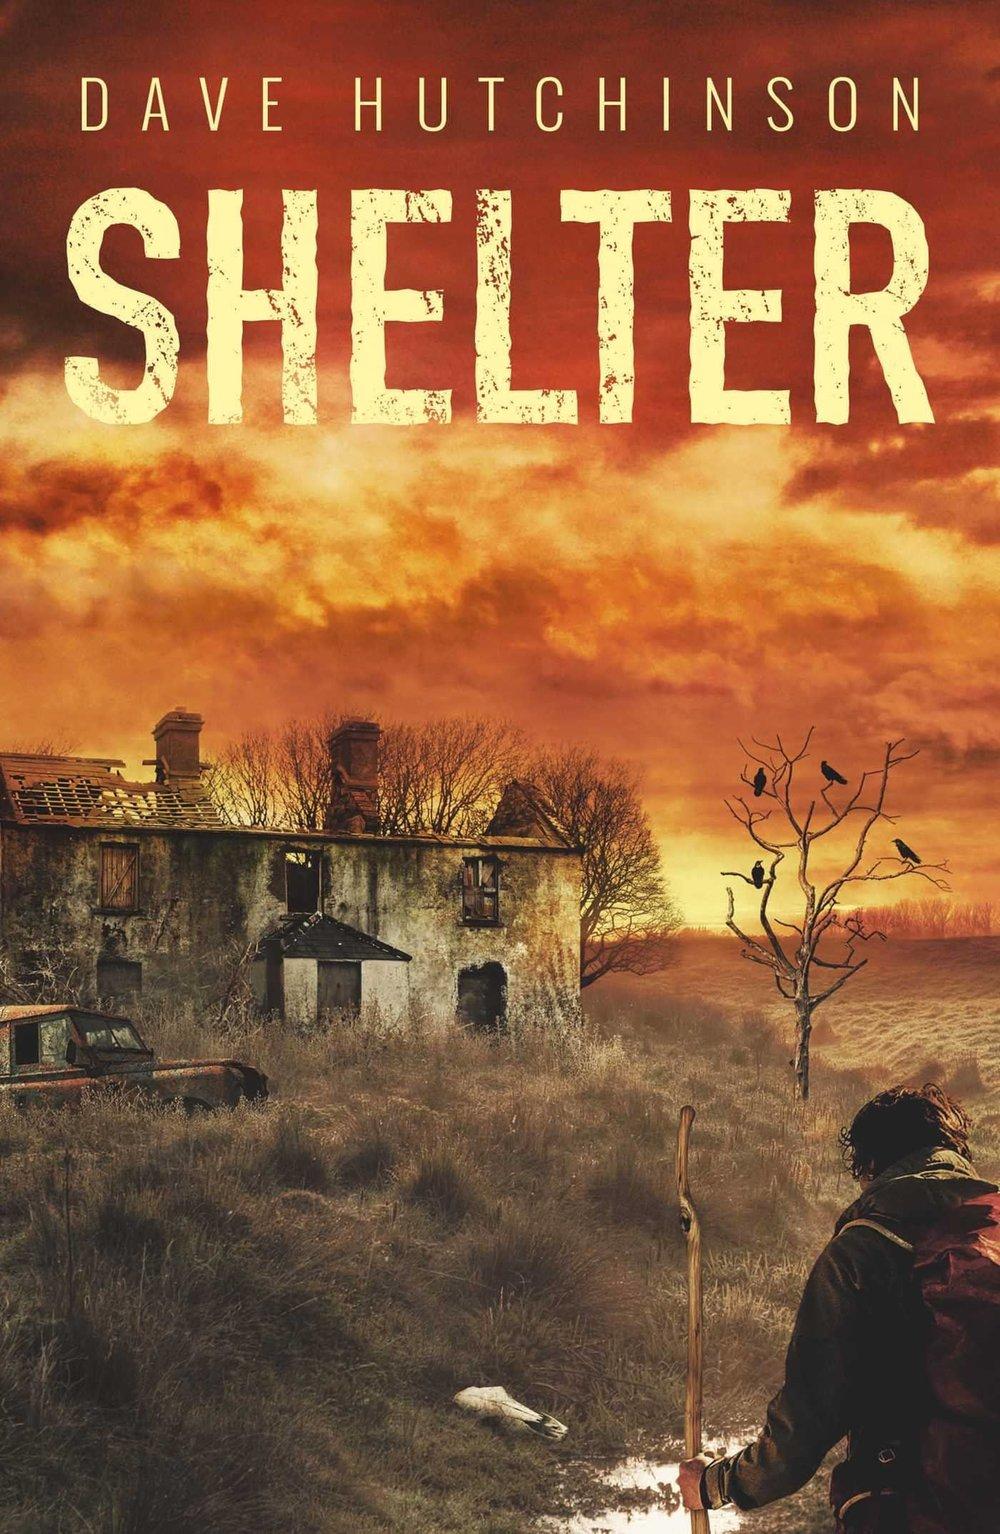 Dave-Hutchinson-Shelter.jpg